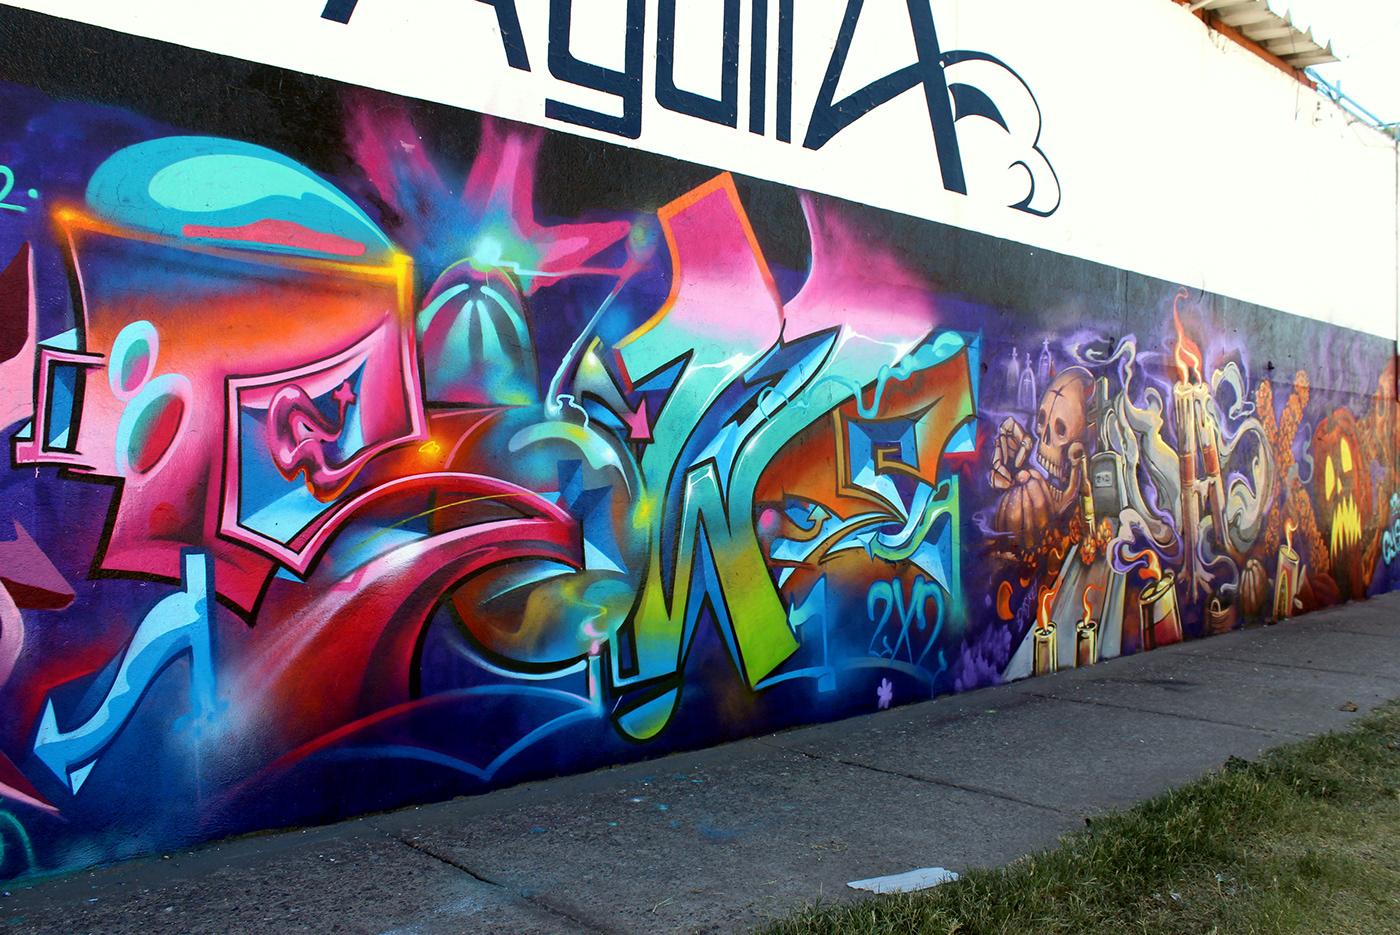 Image may contain: graffiti, abstract and colorful